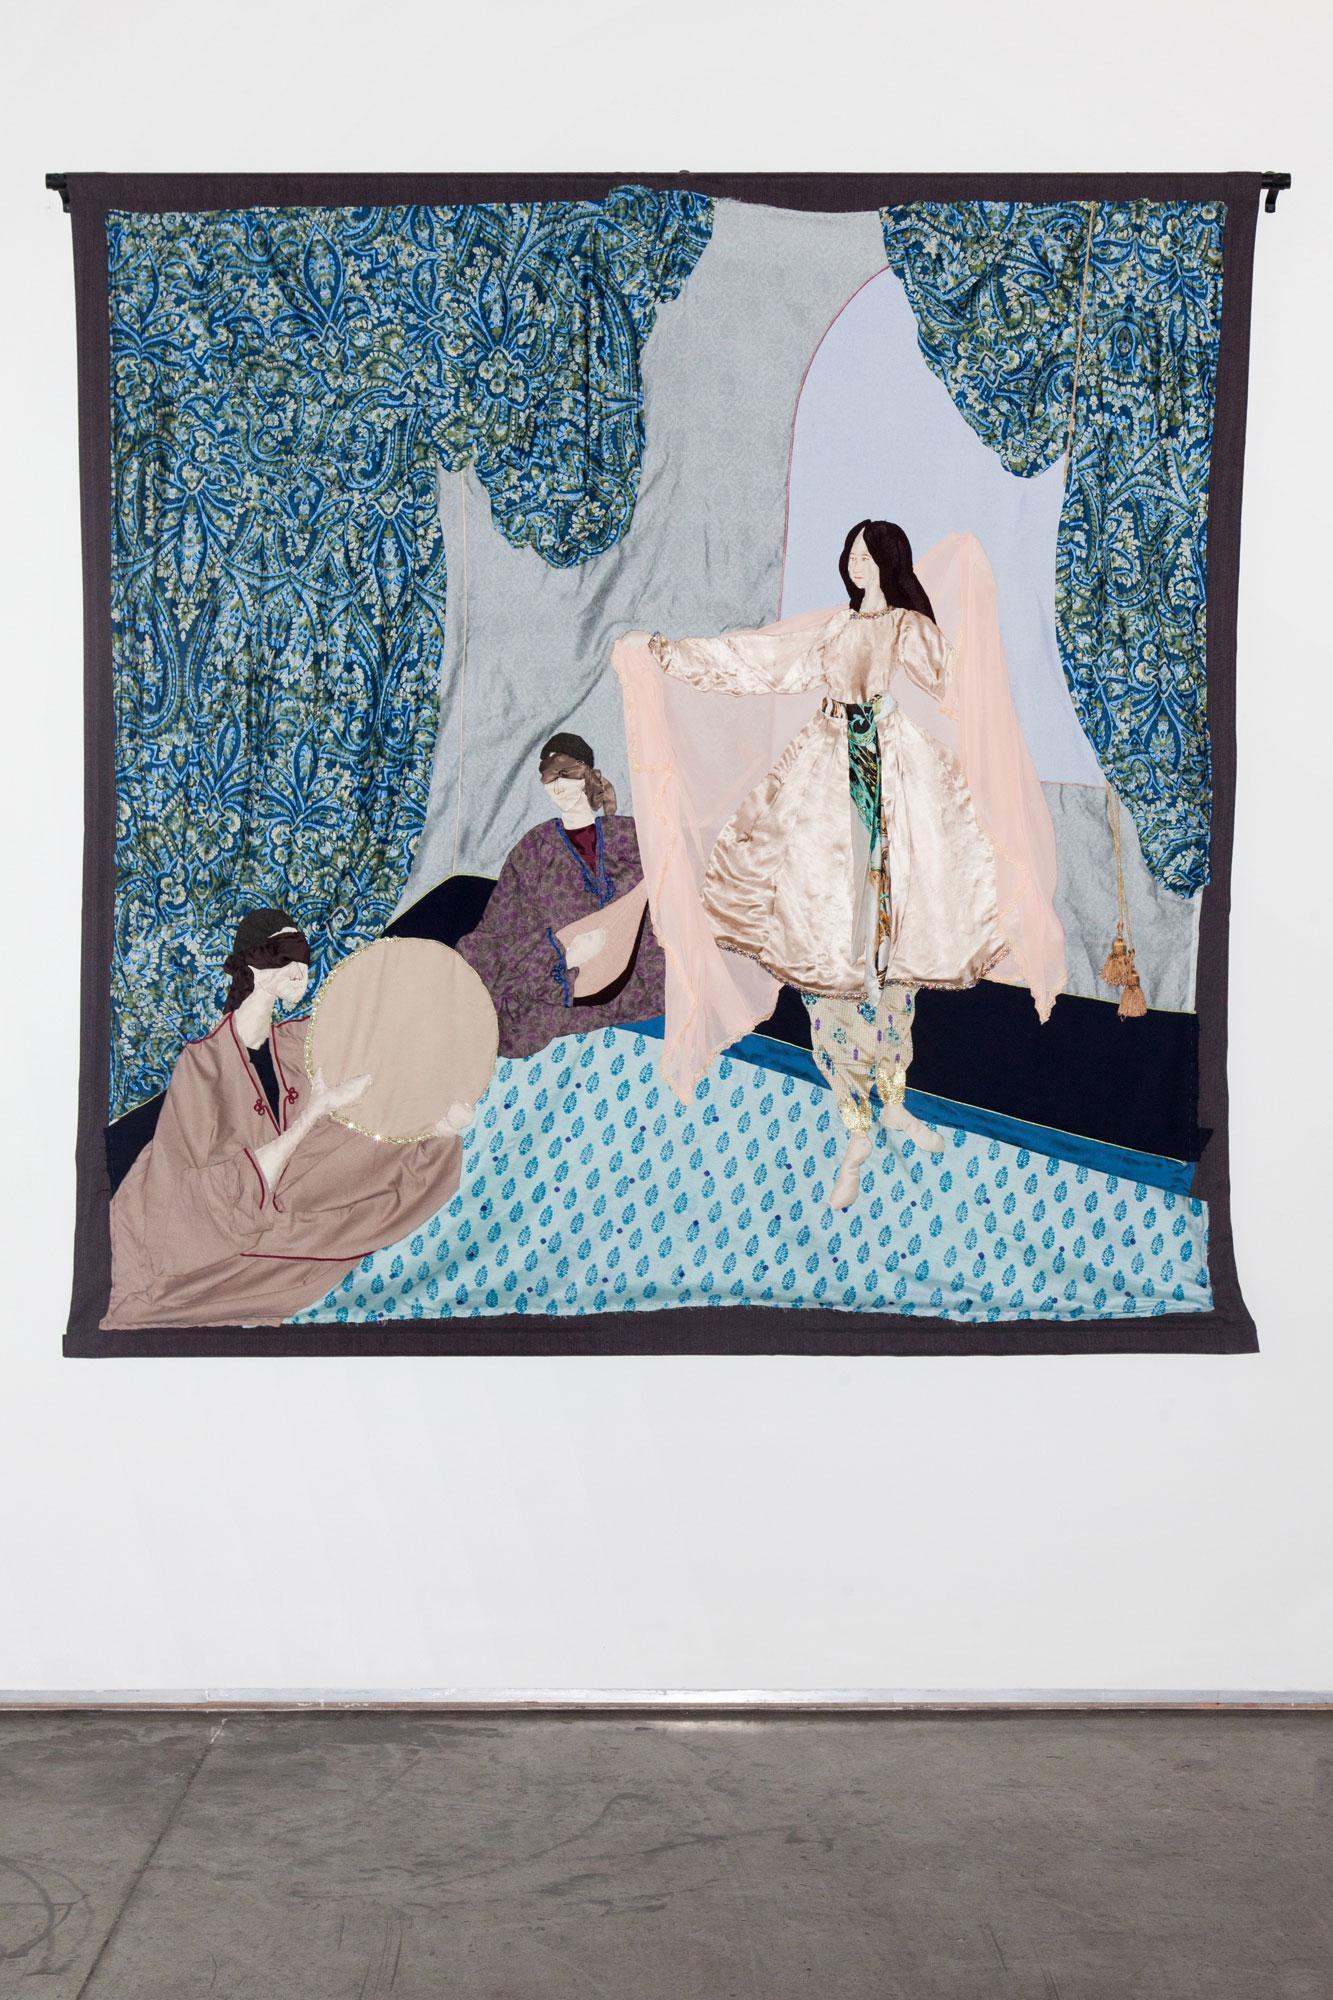 Gallery Isabelle van den Eynde /Raqs, Moorcheh-Dāreh (Dance, Got Ants…) II/byZahra Imani